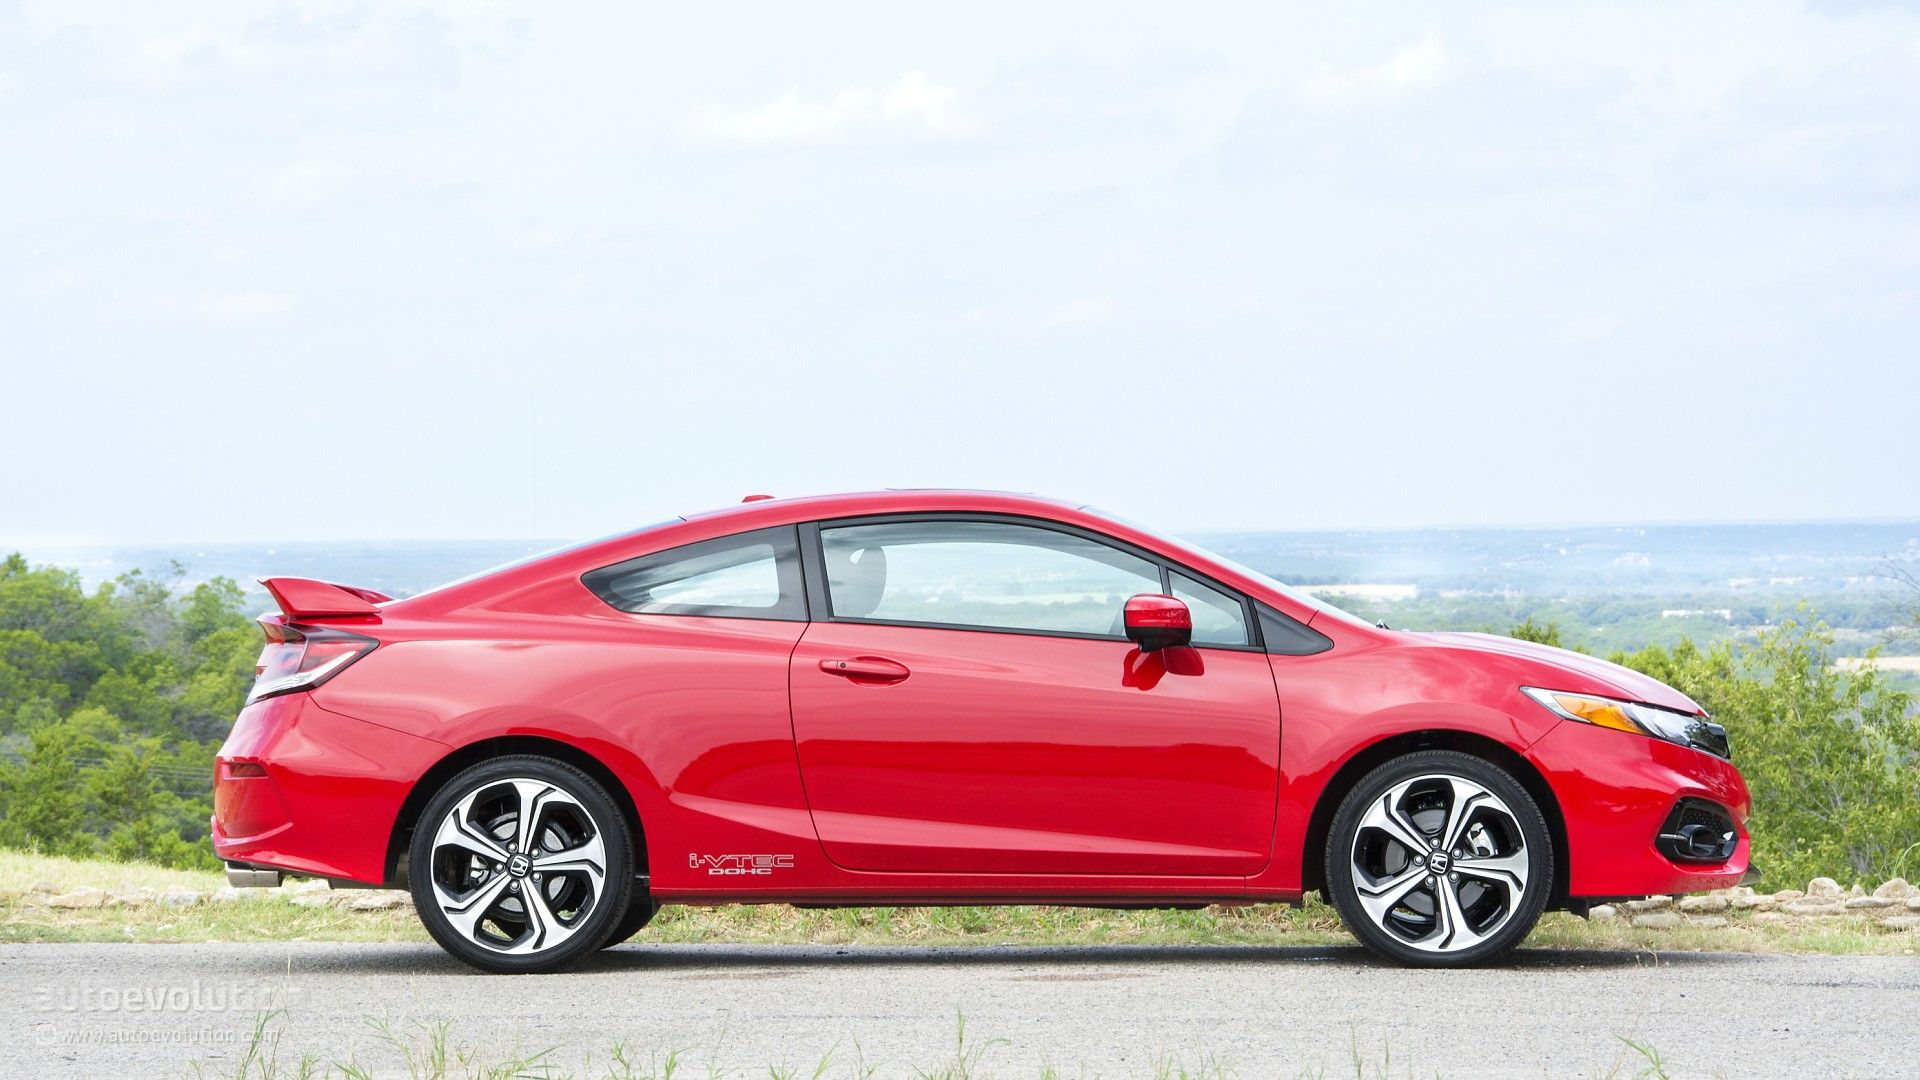 2015 honda civic si coupe review http www autoevolution com